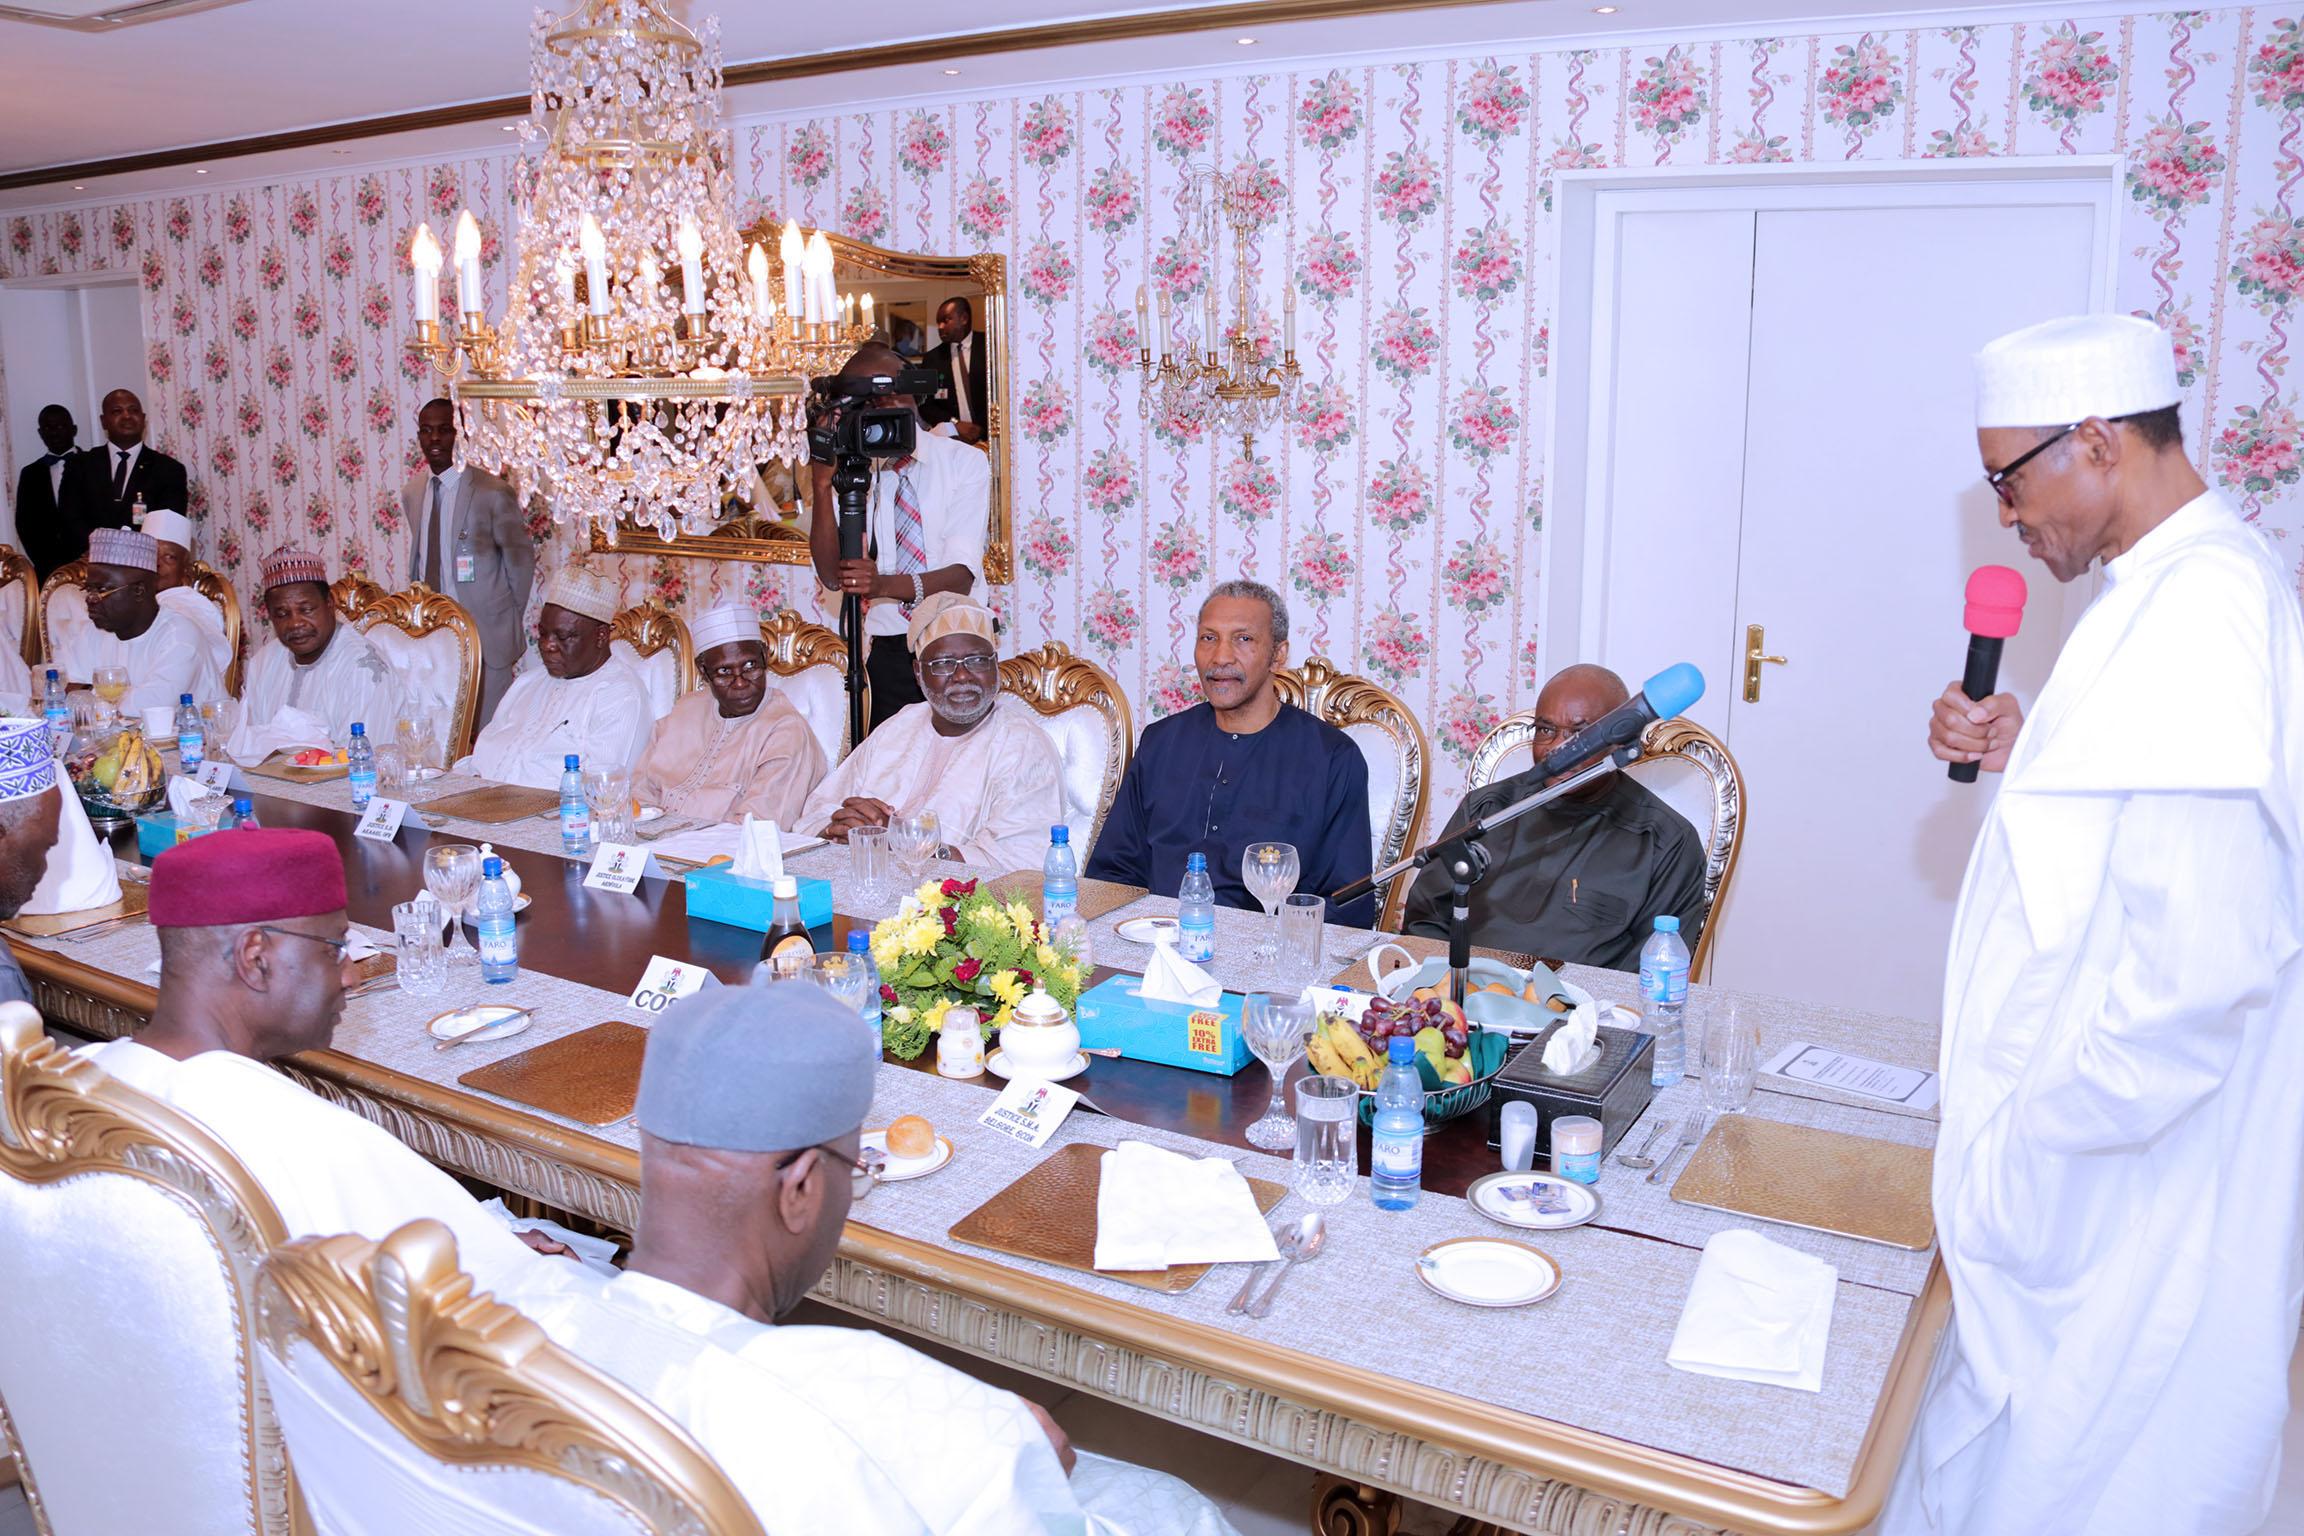 PRESIDENT BUHARI HOST JUDICIARY TO BREAKING OF RAMADAN FAST A&B. From Right; President Muhammadu Buhari addressing members of the Judiciary during breaking of Ramadan Fast at his Residence Thursday night in Abuja. PHOTO; SUNDAY AGHAEZE/STATE HOUSE JUNE 23 2016